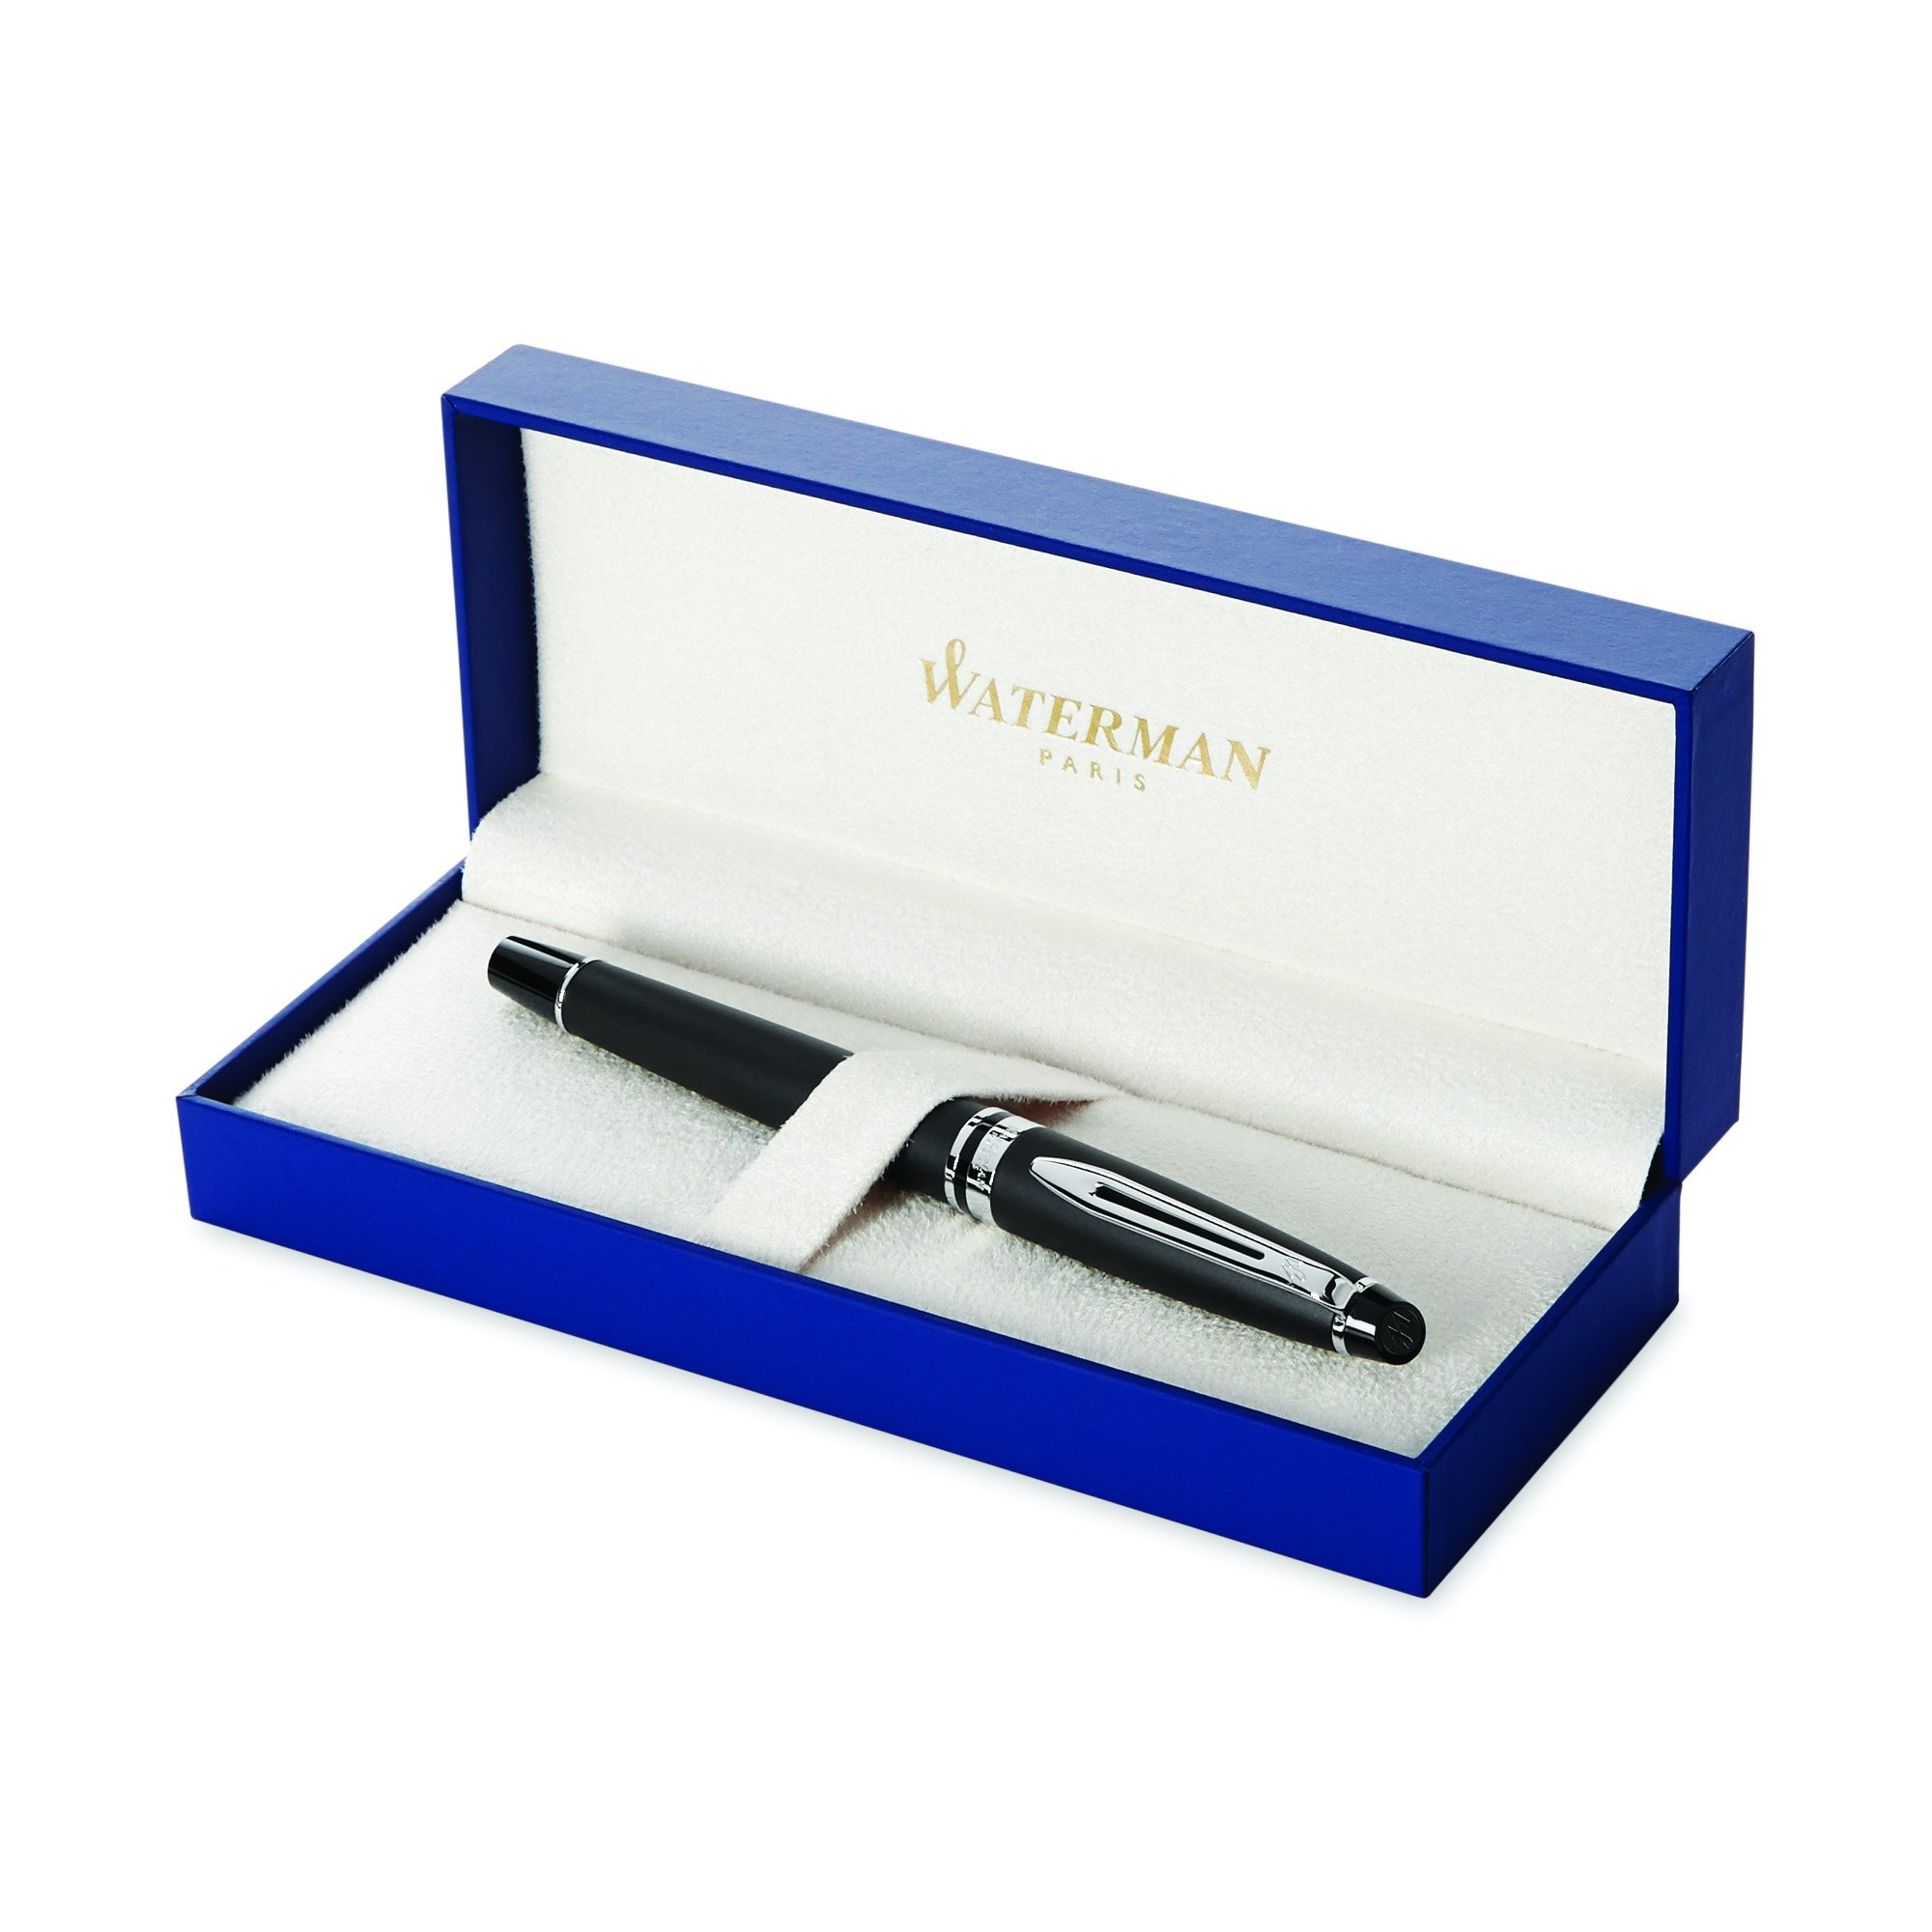 Waterman Expert Matte Black, Fountain Pen with Medium nib and Blue ink (S0951860)